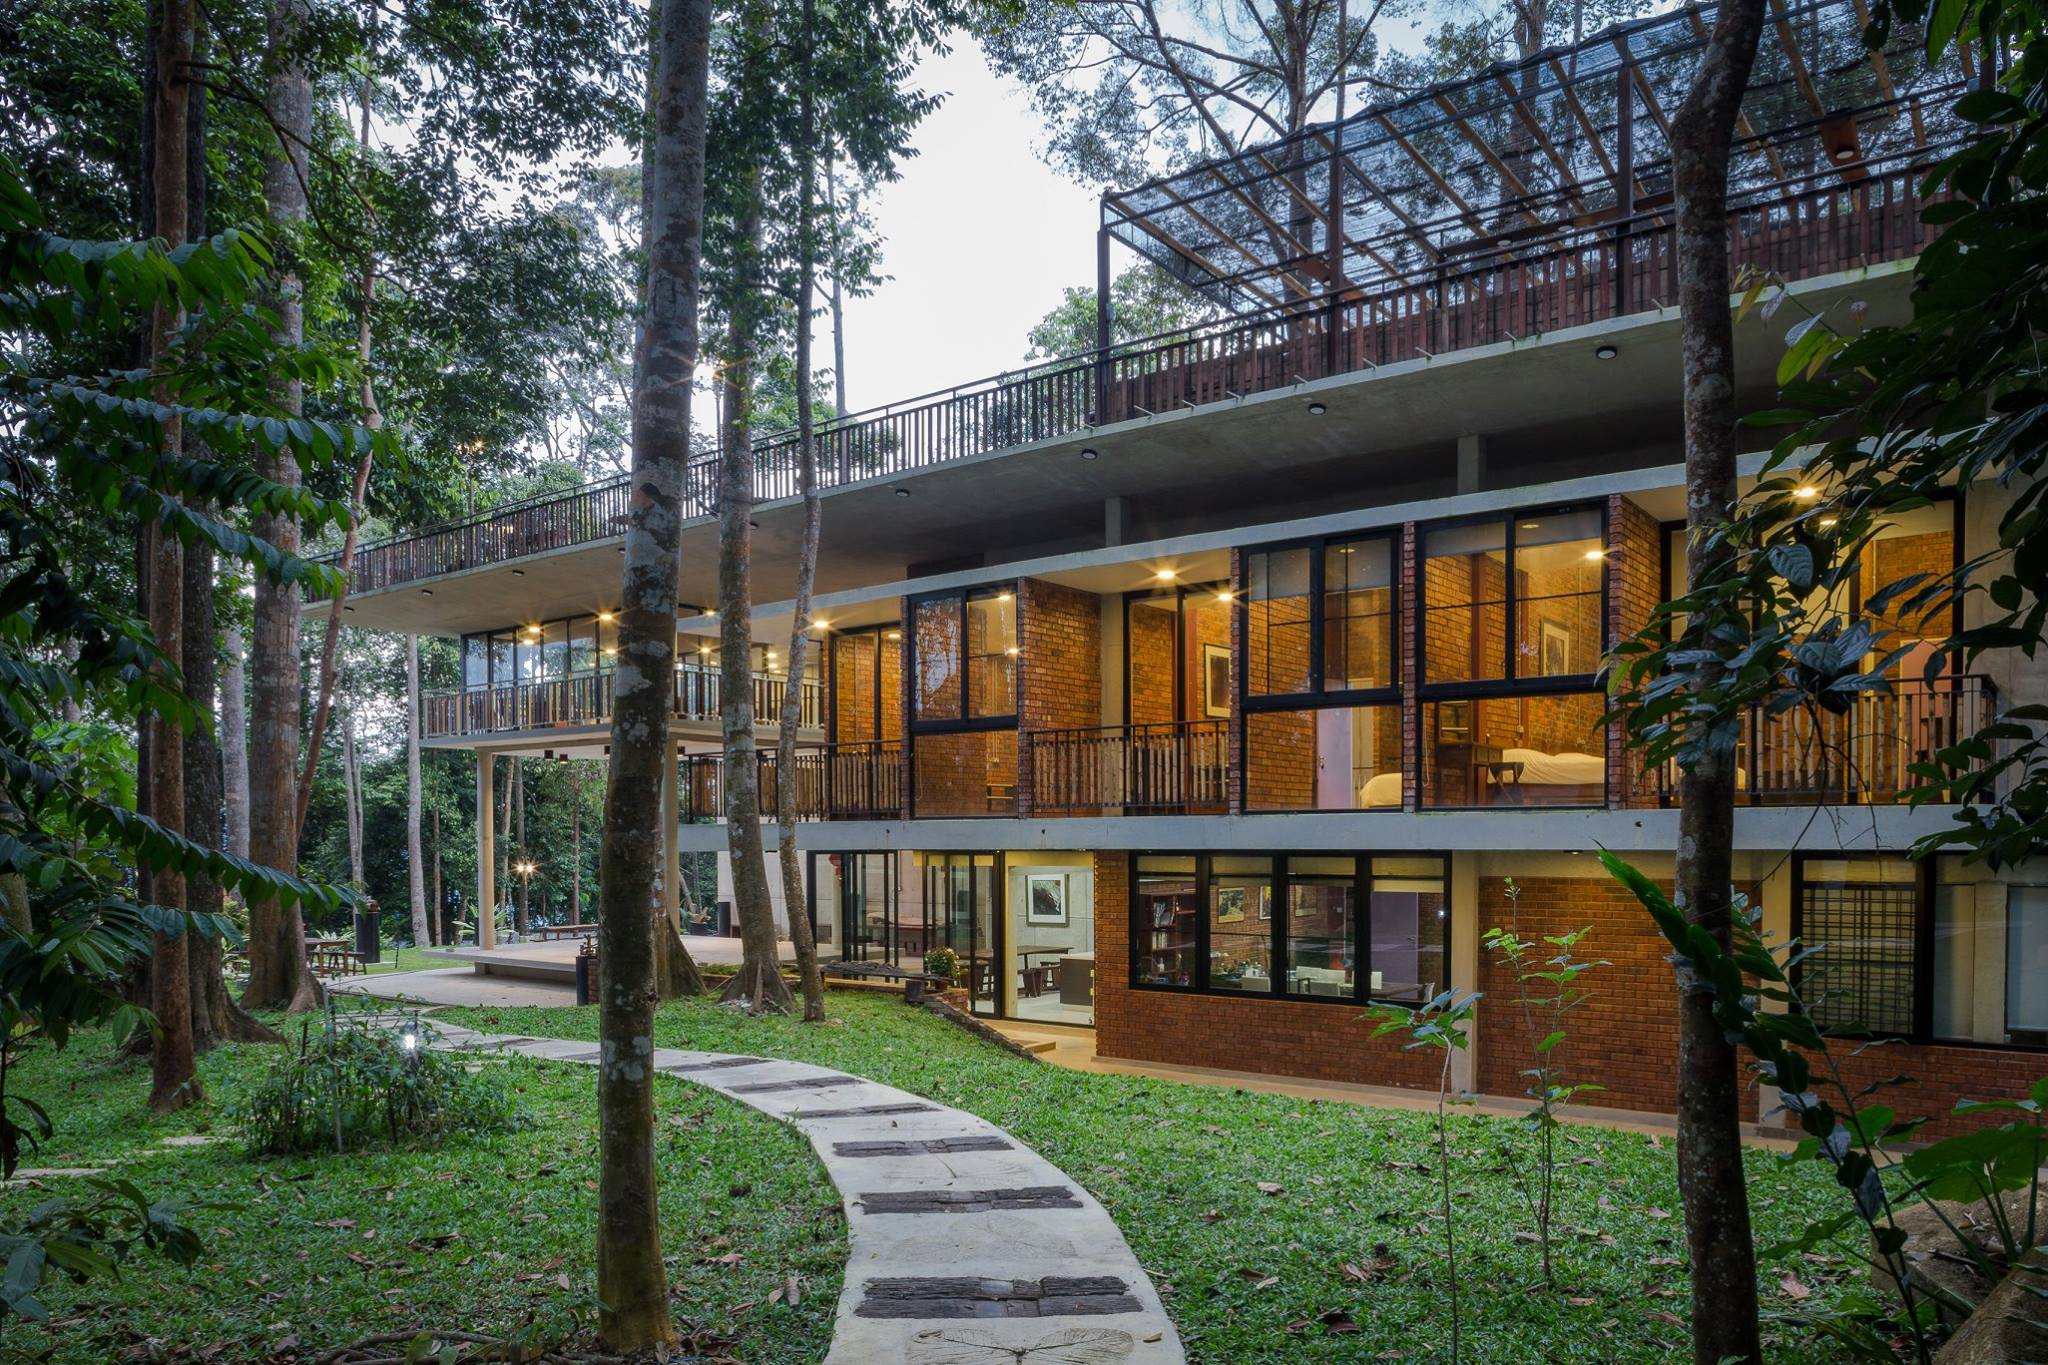 Look at how HUGEEE the award-winning villa is!